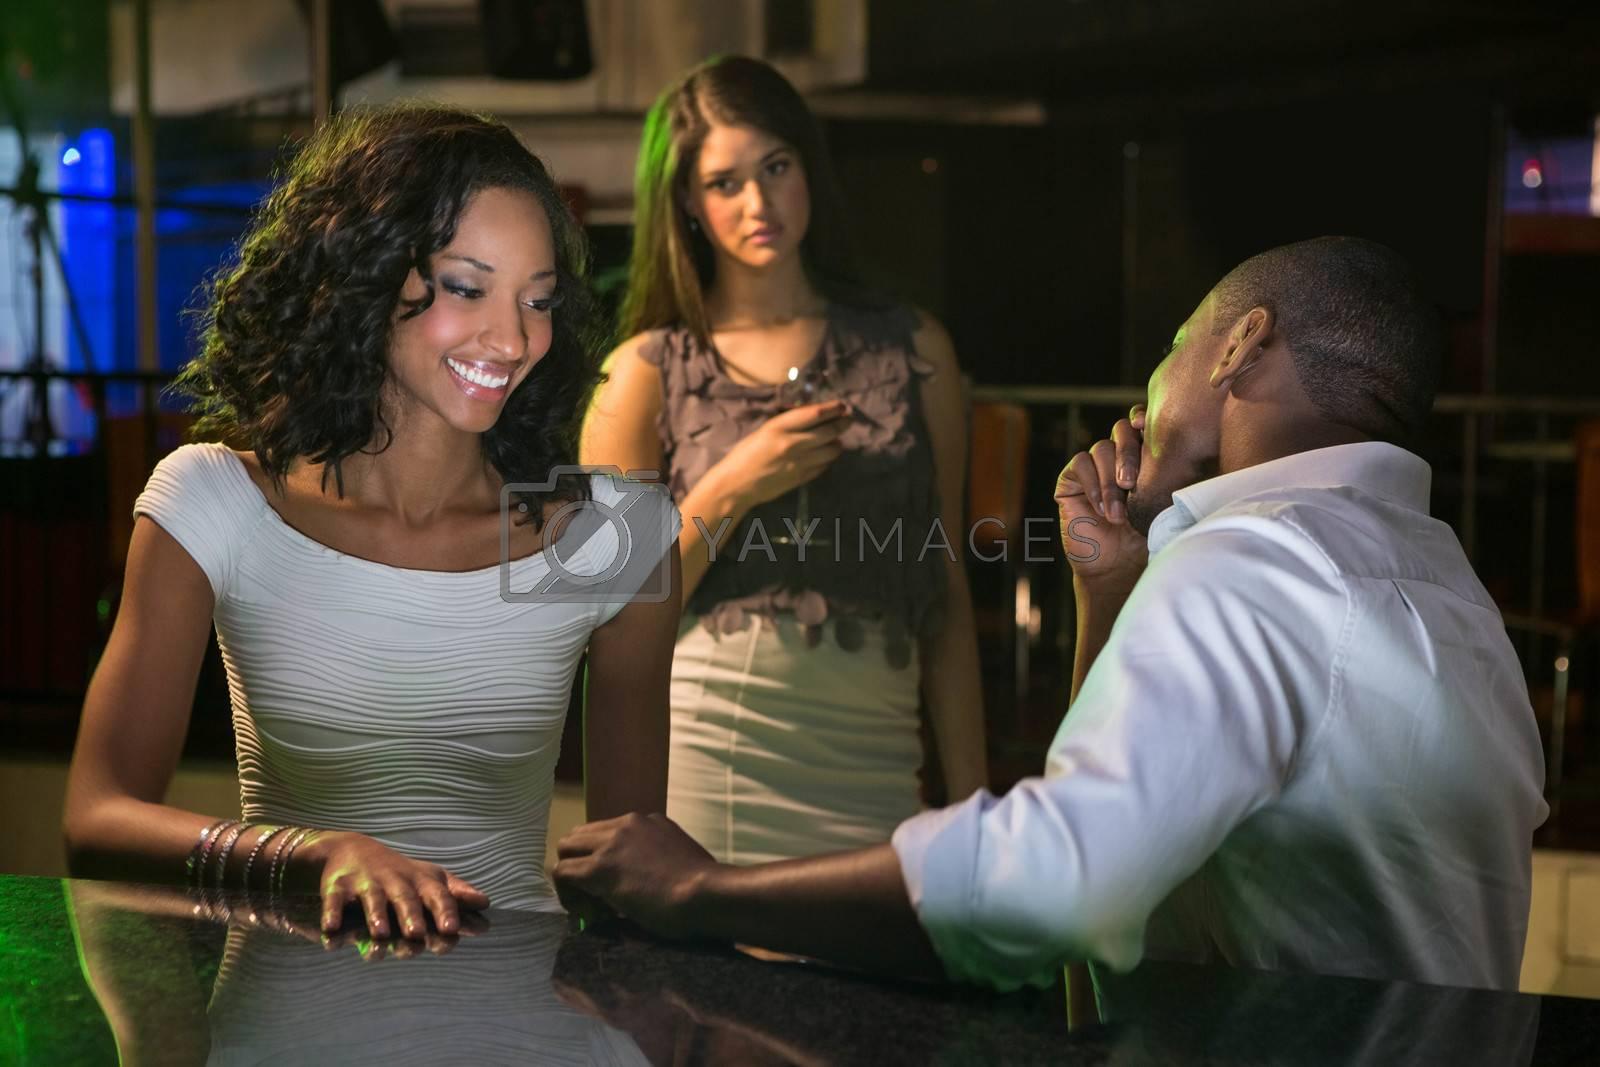 Unhappy woman looking at a couple flirting near bar counter in bar